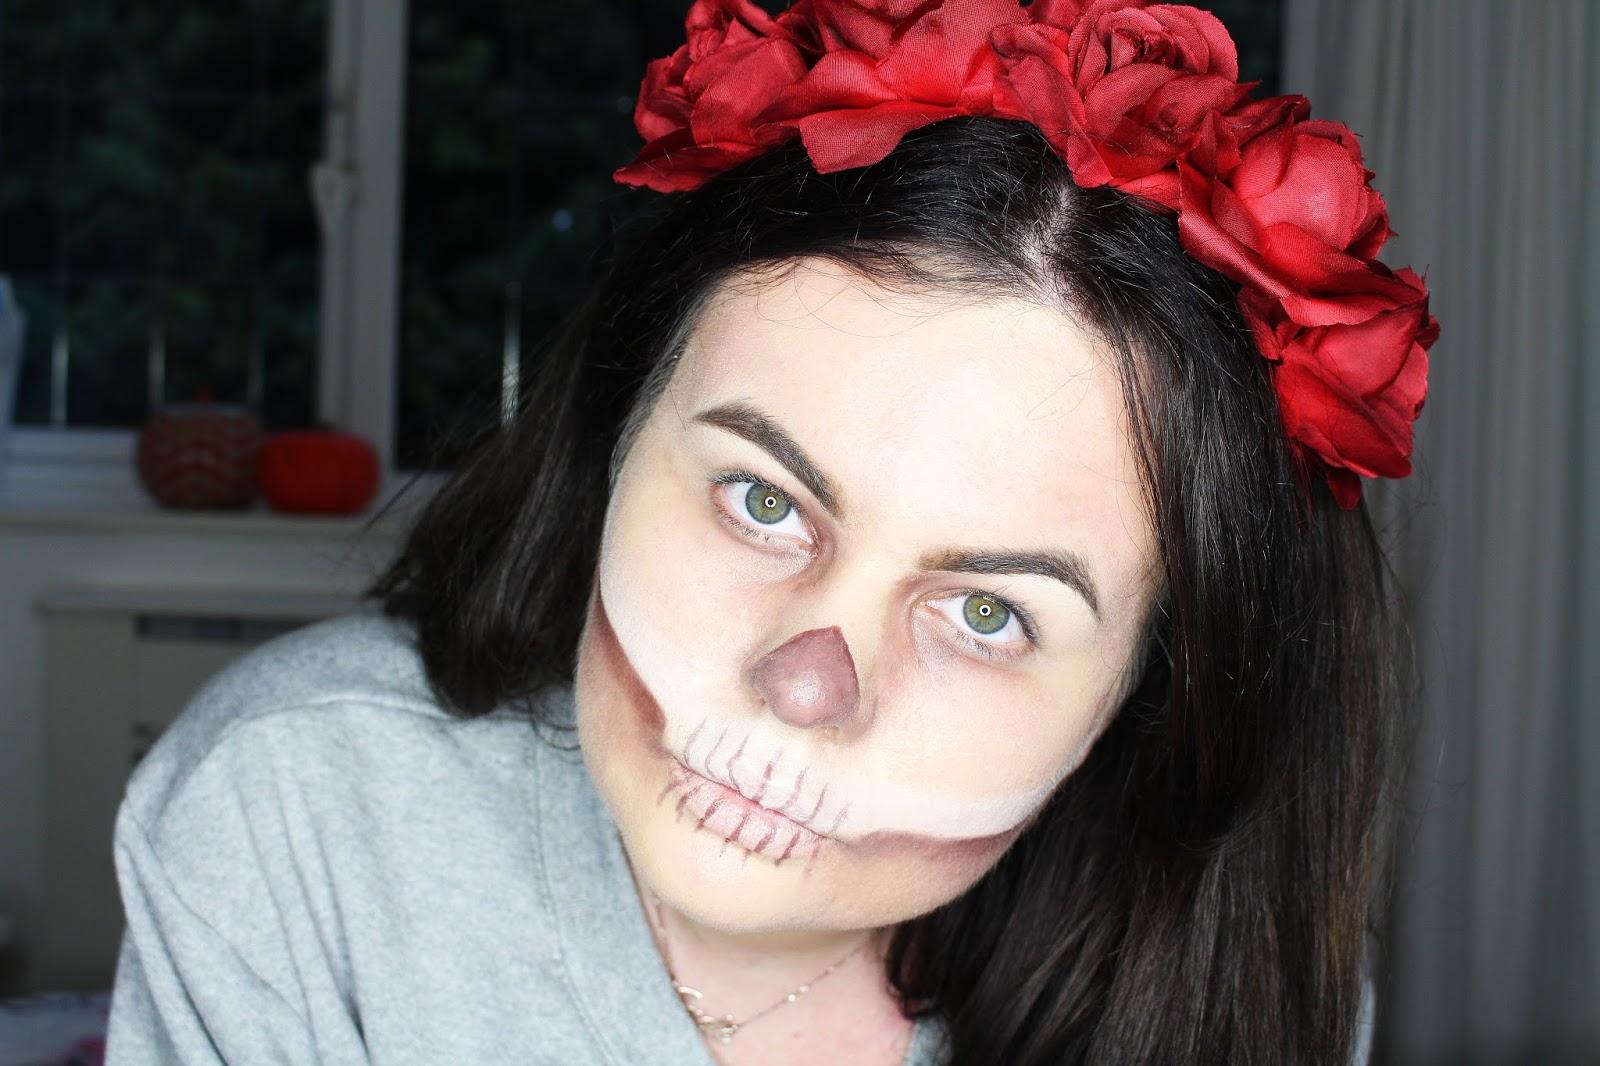 Halloween makeup, halloween tutorial 2016, easy & cheap halloween makeup, cheap halloween outfit 2016, easy halloween make up tutorial, last minute halloween outfit 2016, last minute halloween makeup, halloween skull tutorial, halloween wednesday adams tutorial,